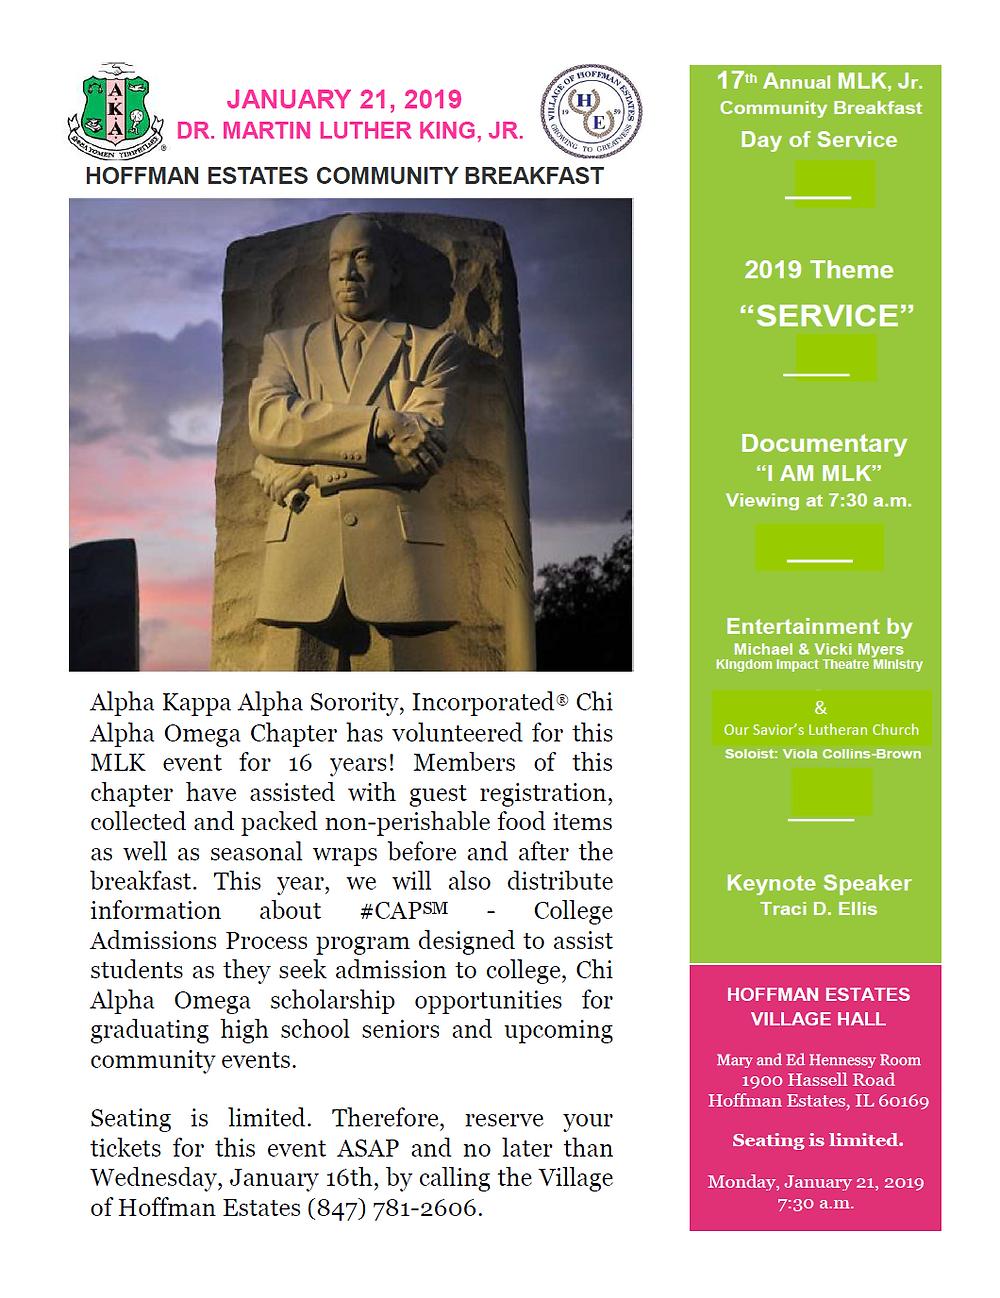 MLK Day of Service Flyer